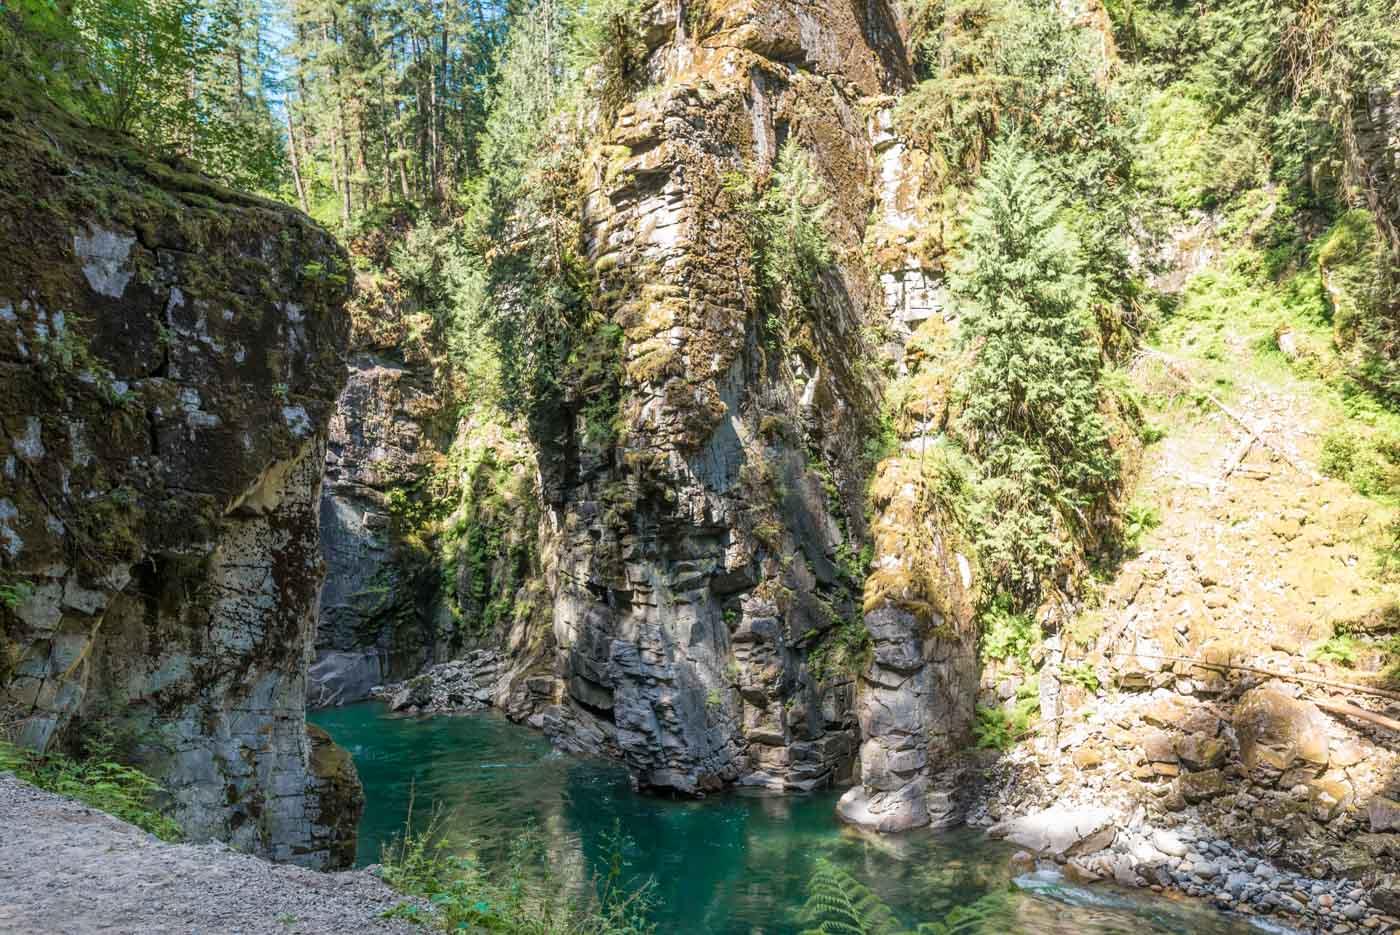 Coquihalla River, Coquihalla Canyon Provincial Park